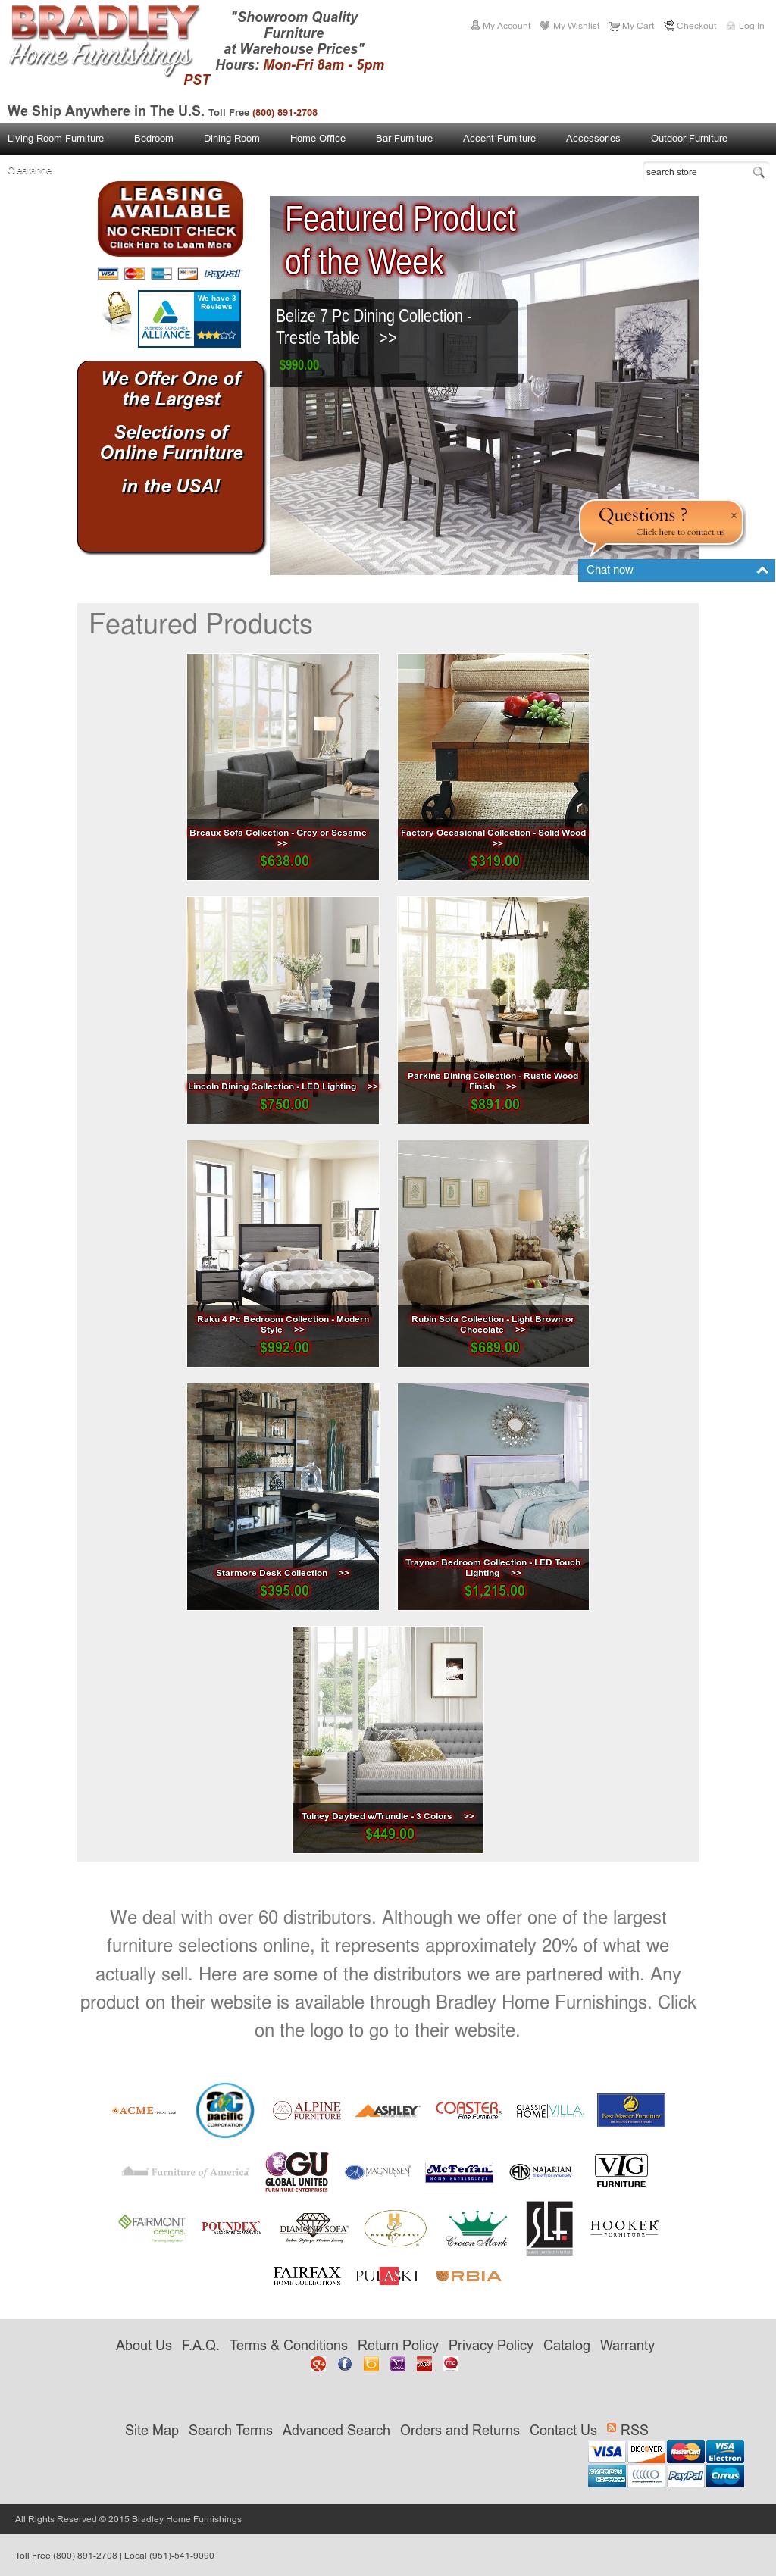 Bradley Home Furniture Website History